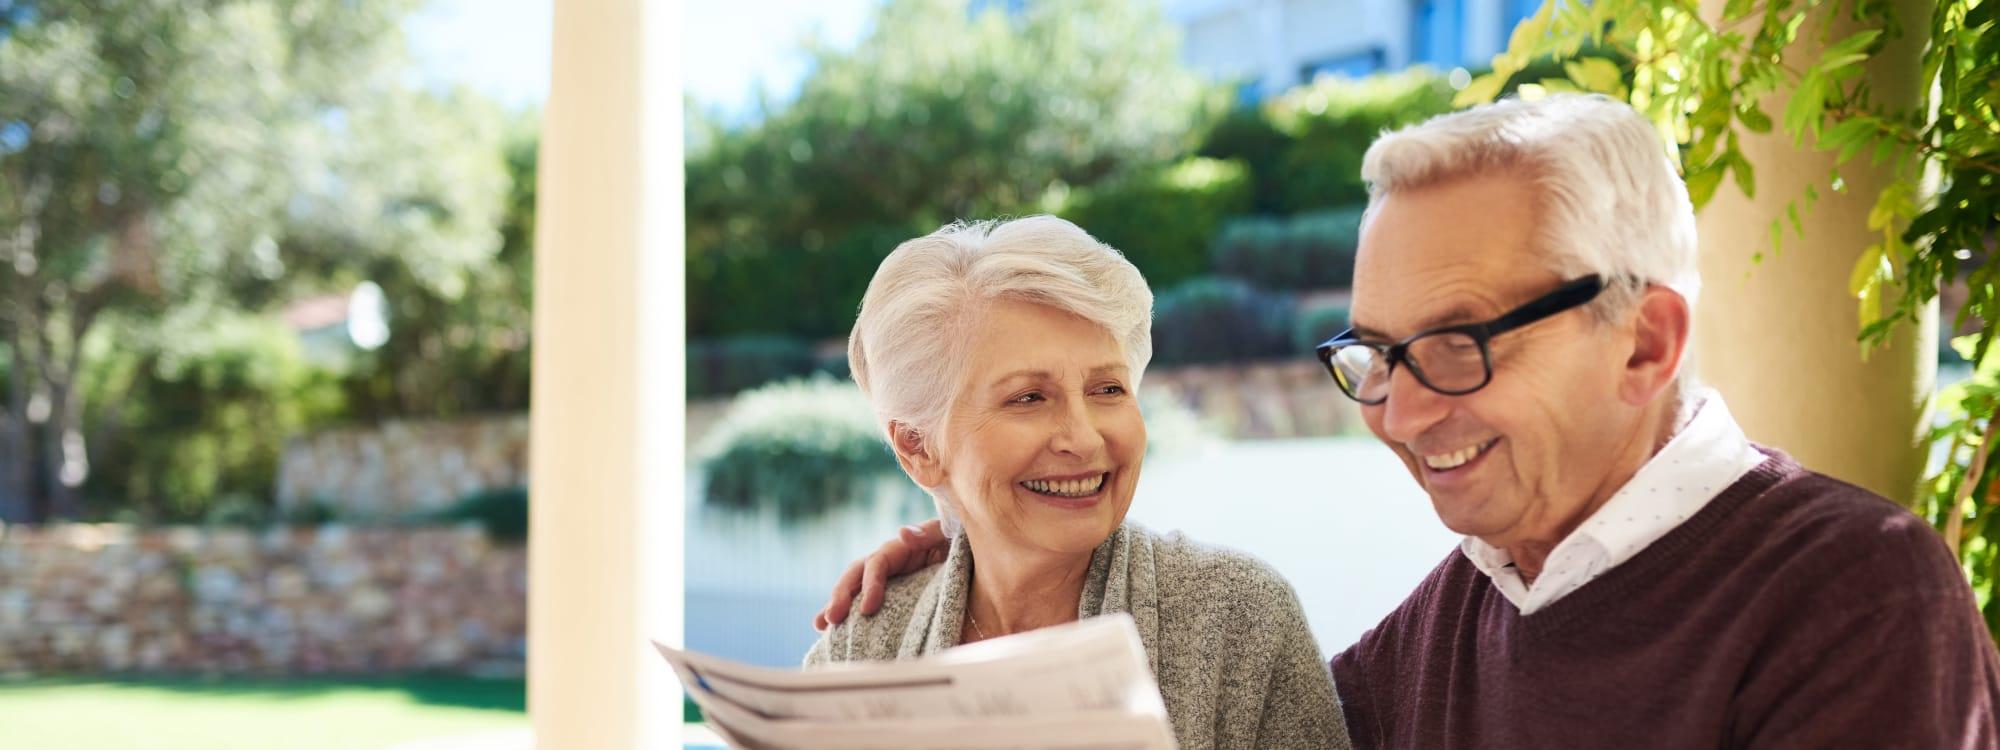 I'm Looking For - My Spouse at Ebenezer Senior Living